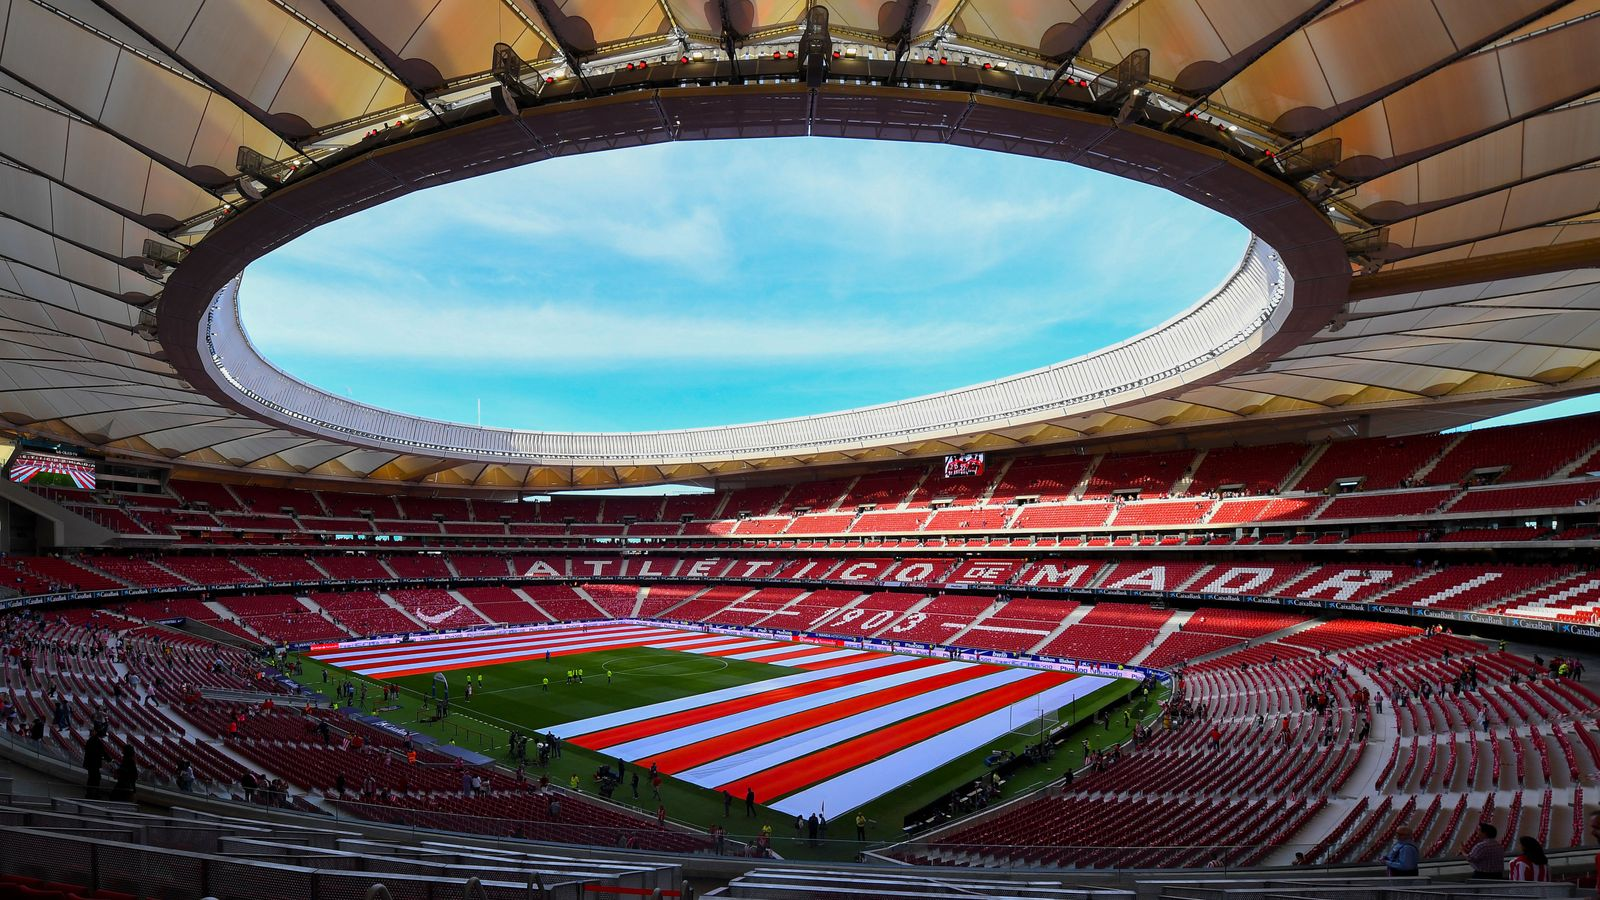 Atletico Madrid's Wanda Metropolitano stadium to host the